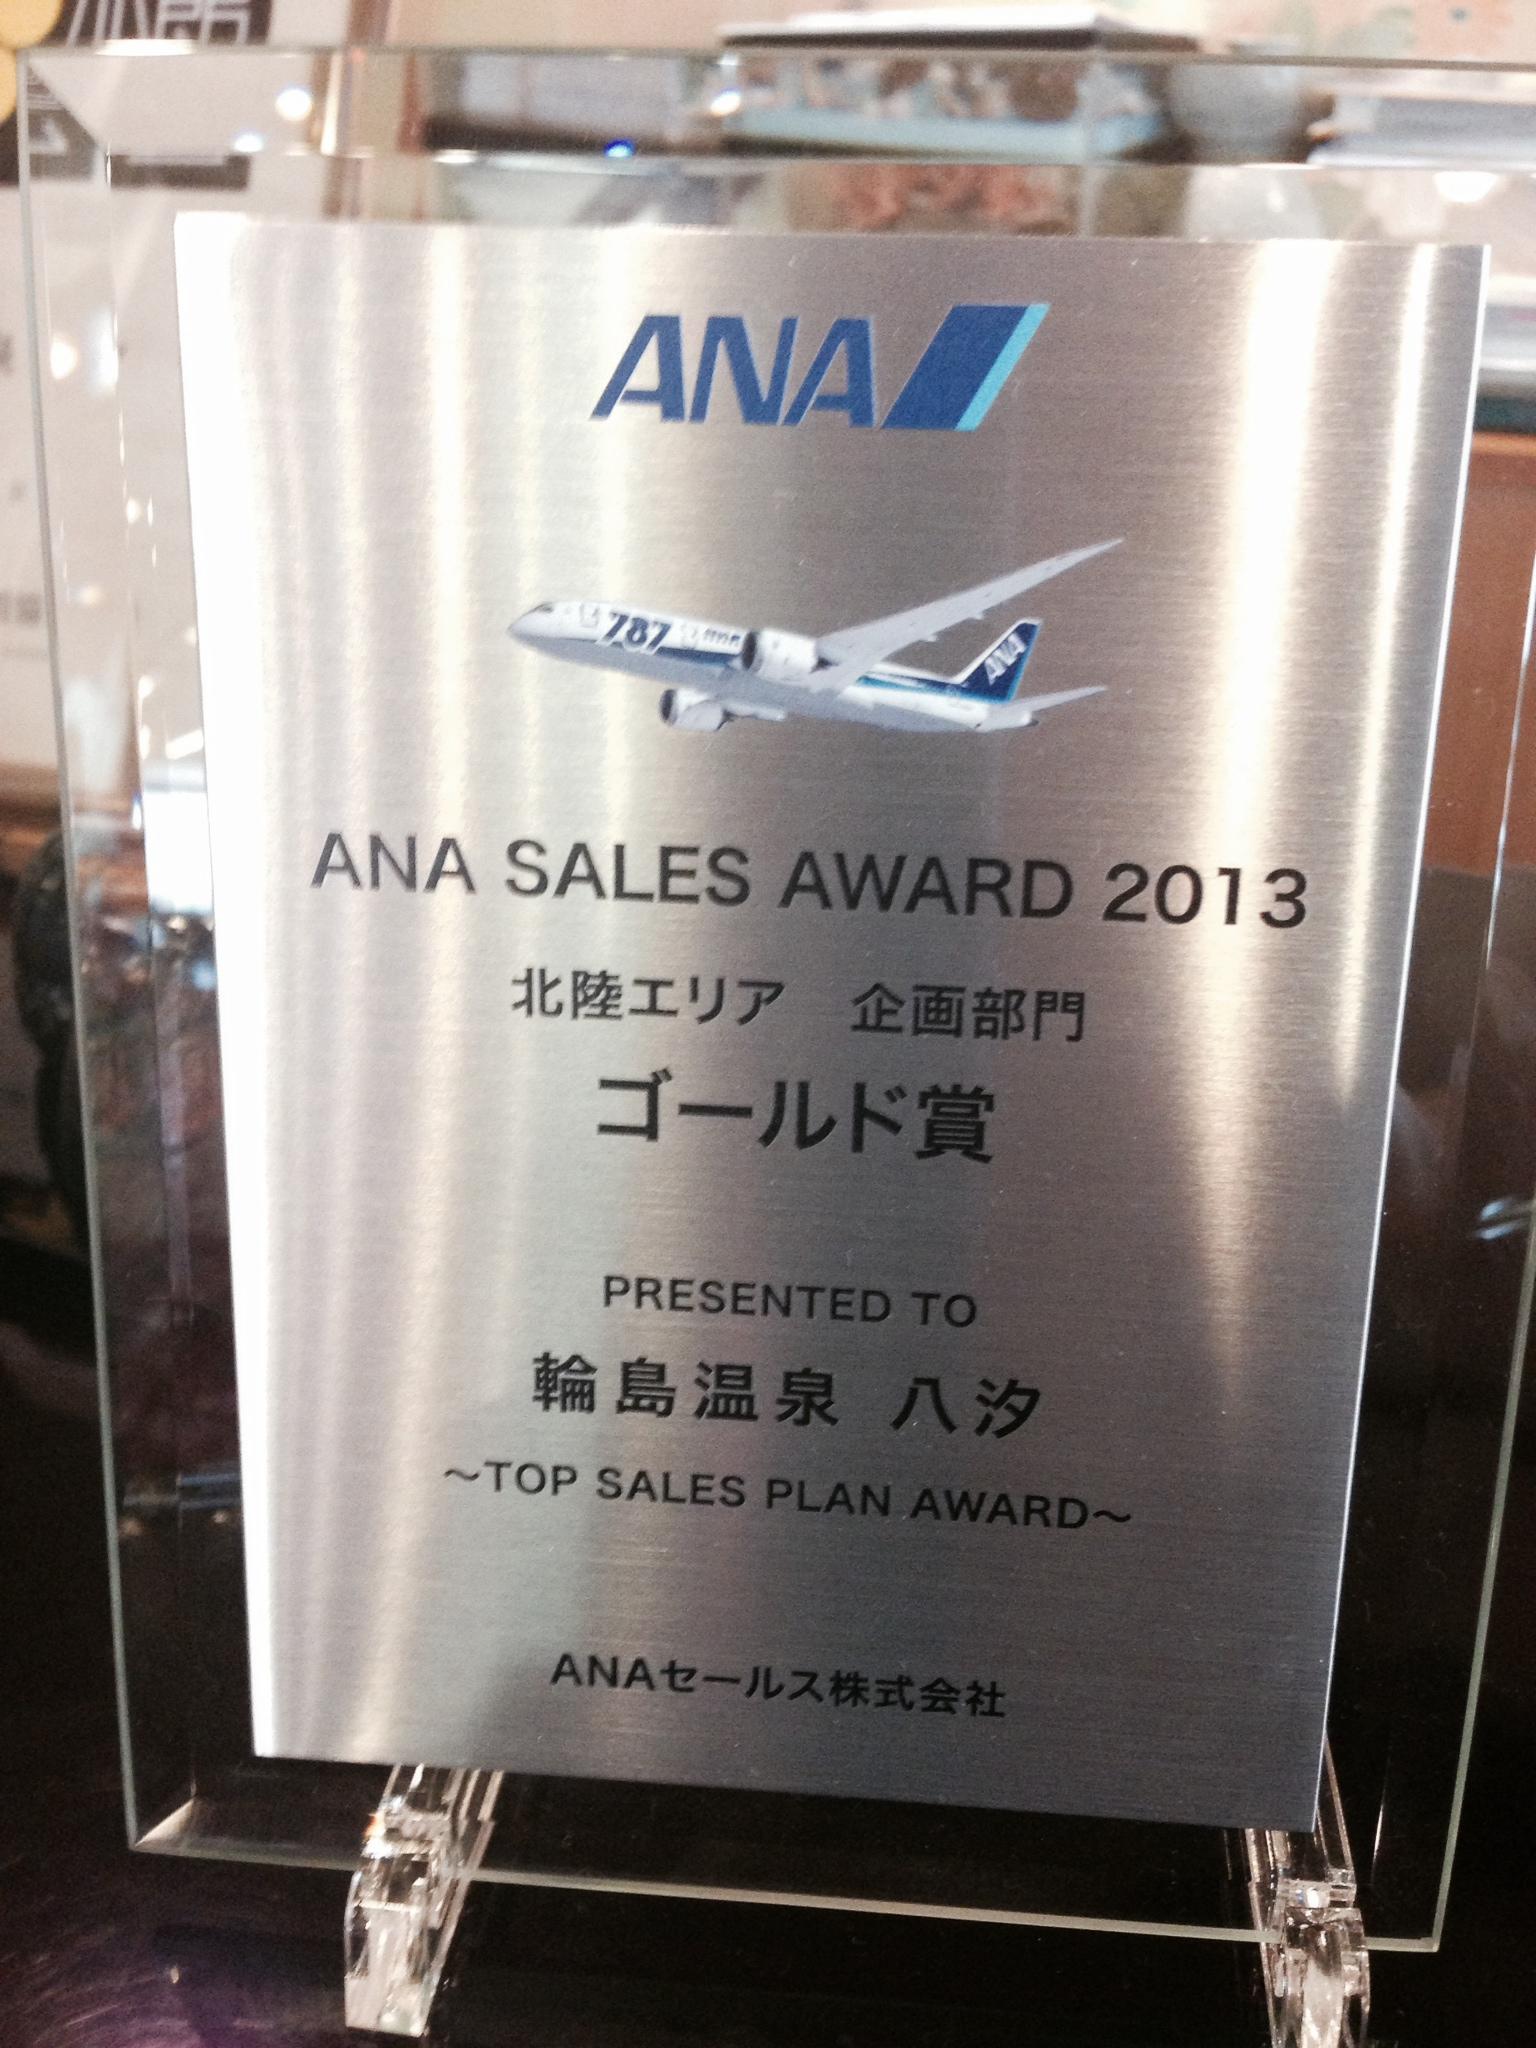 ANA SALES AWARD 2013 企画部門 ゴールド賞をいただき